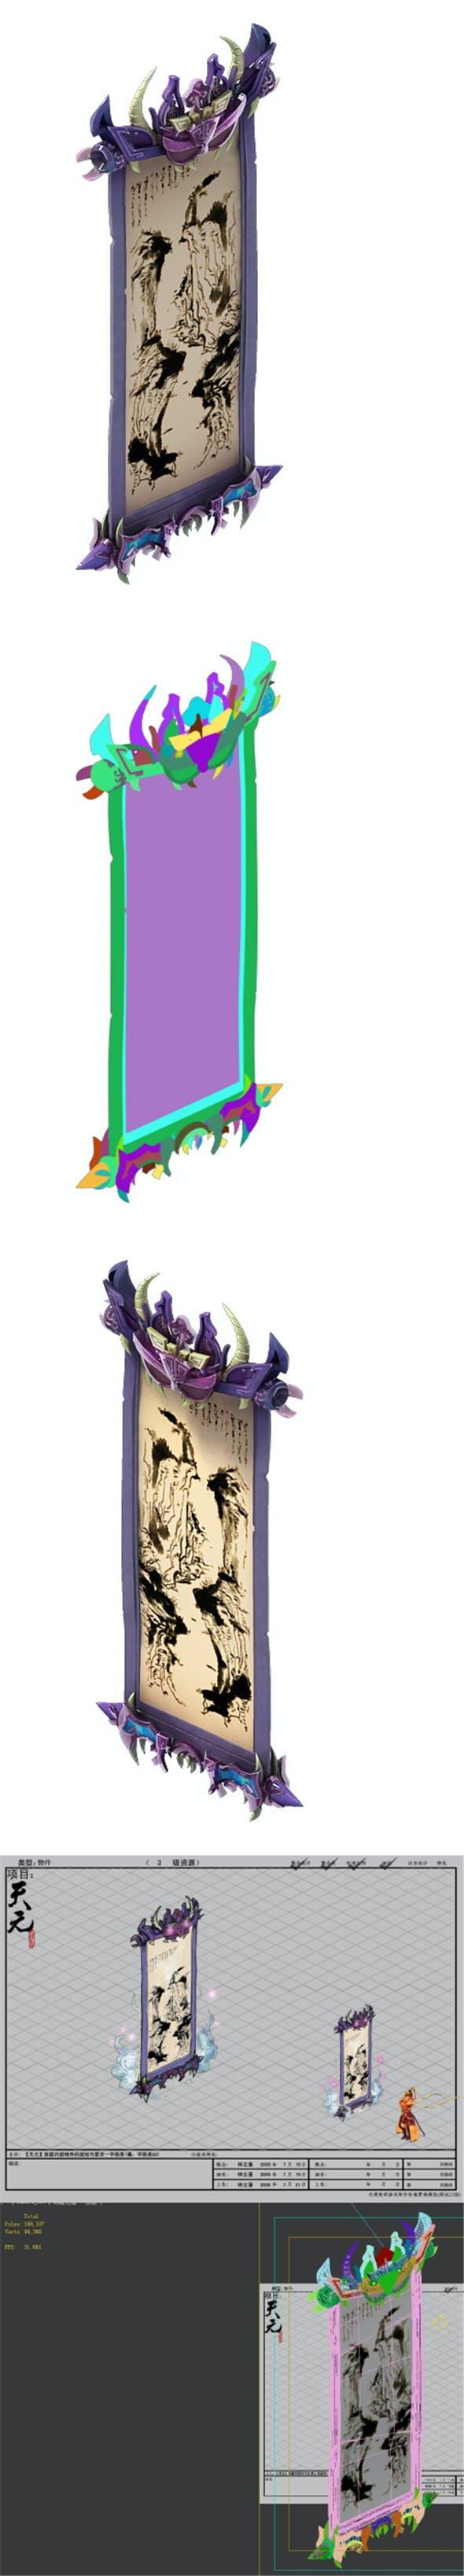 Game Model - Model - Family Objects - Zijin Lighthouse Bookshelf 02 - 3DOcean Item for Sale